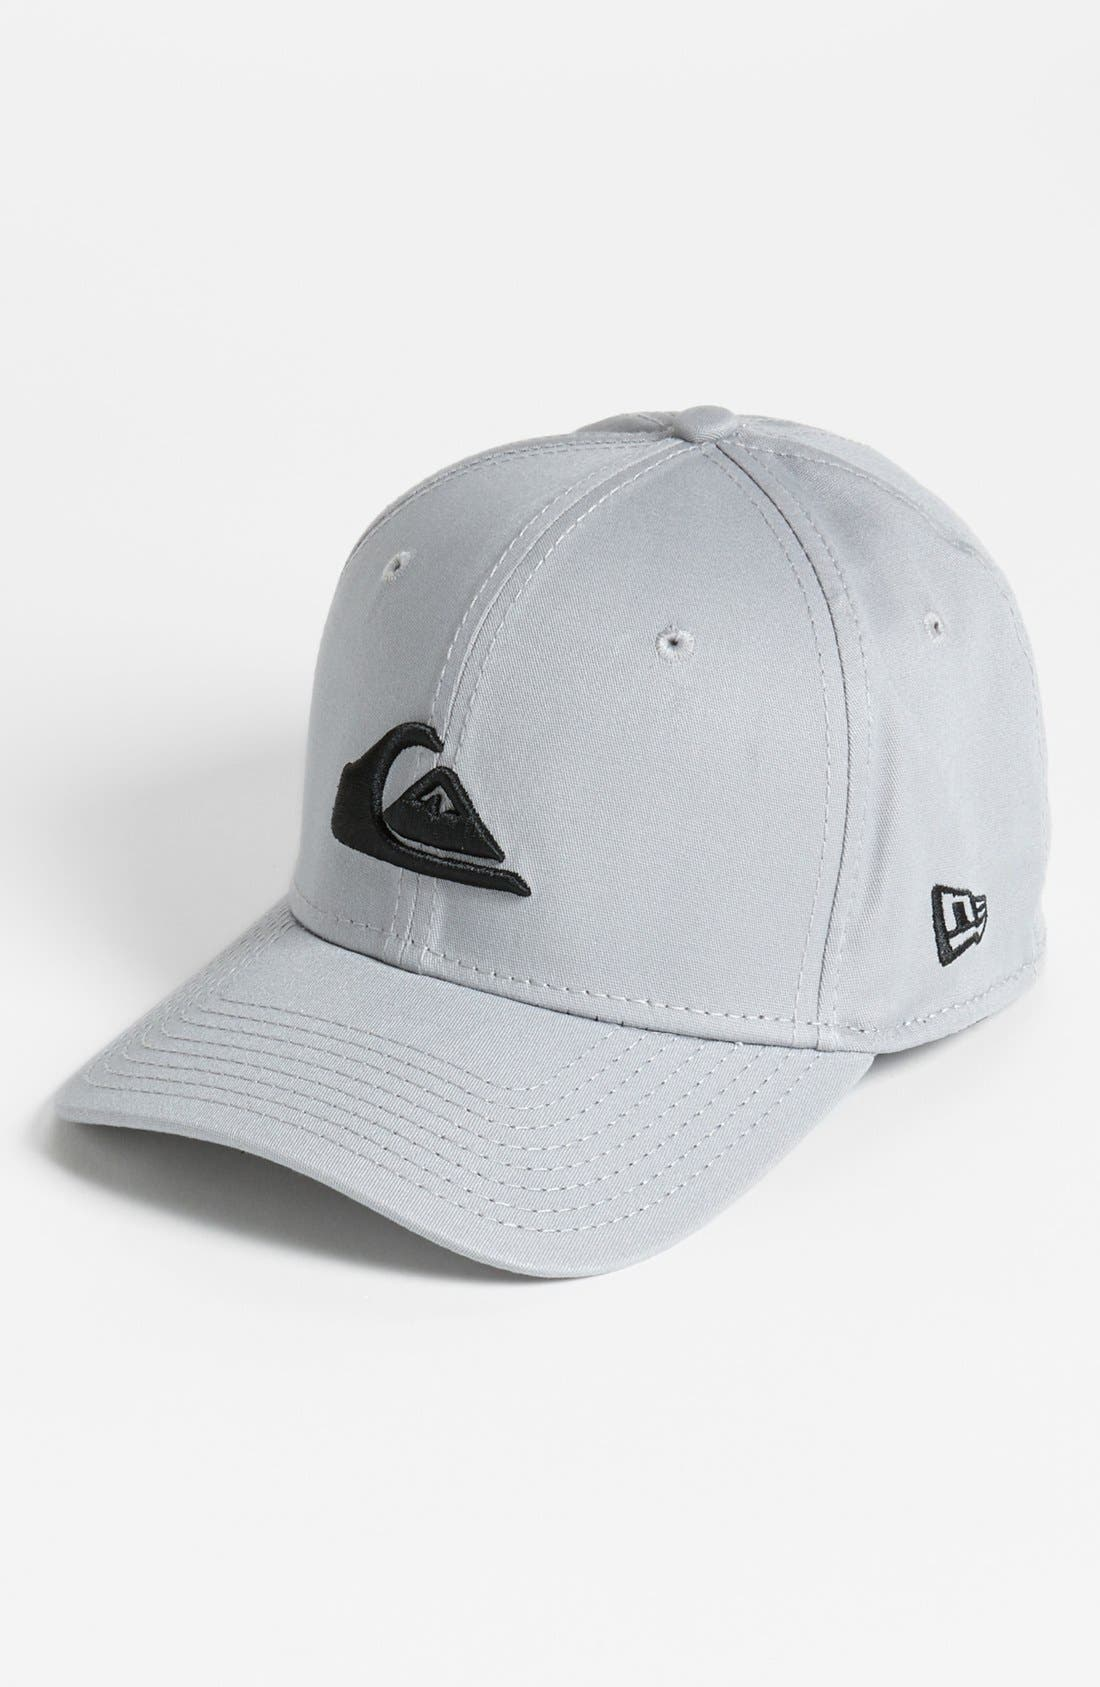 Main Image - Quiksilver 'Ruckis' Baseball Cap